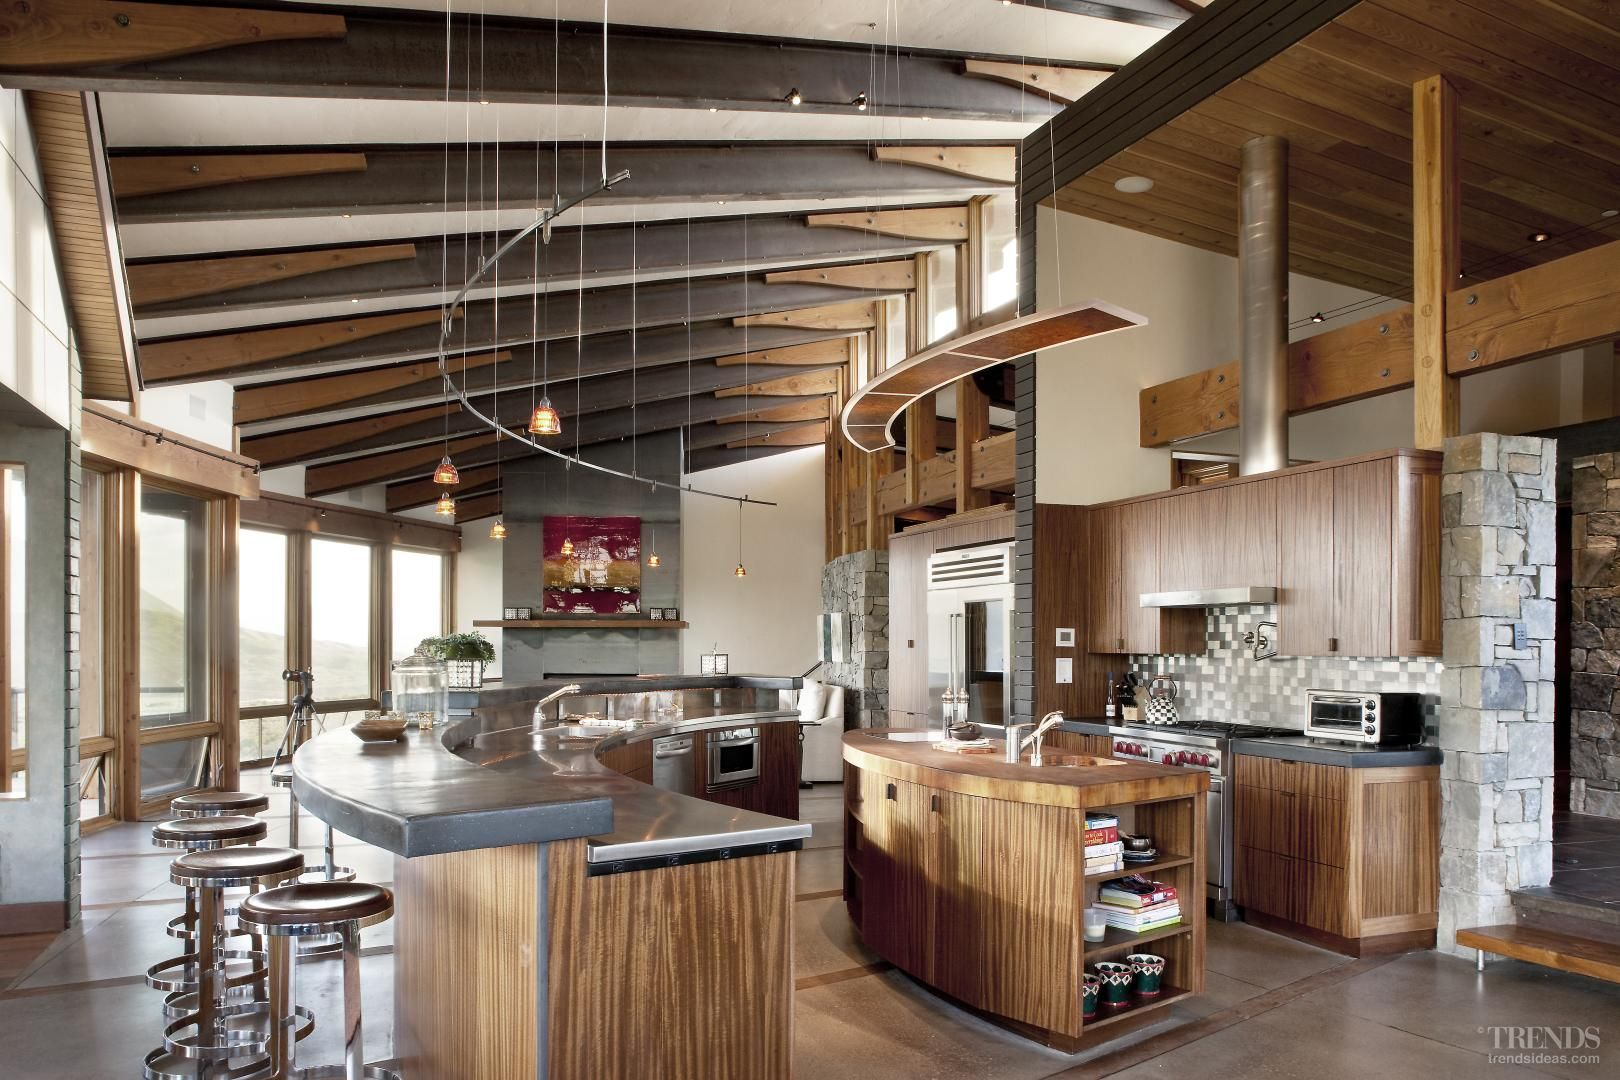 amazing kitchen design traditional kitchen design on awesome modern kitchen design ideas id=73470